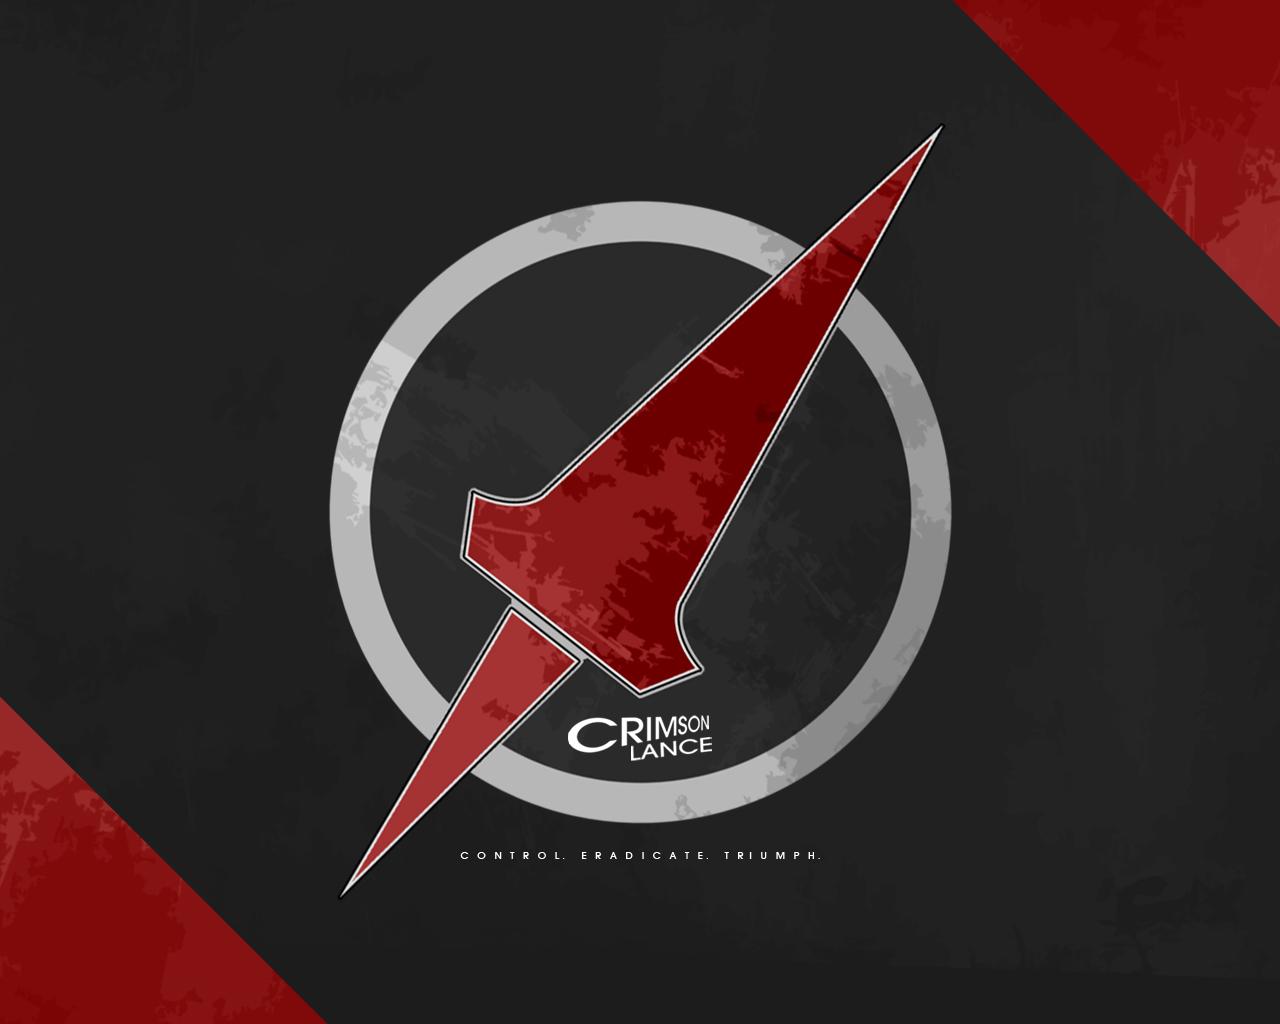 Crimson_Lance_by_Anetheon.jpg